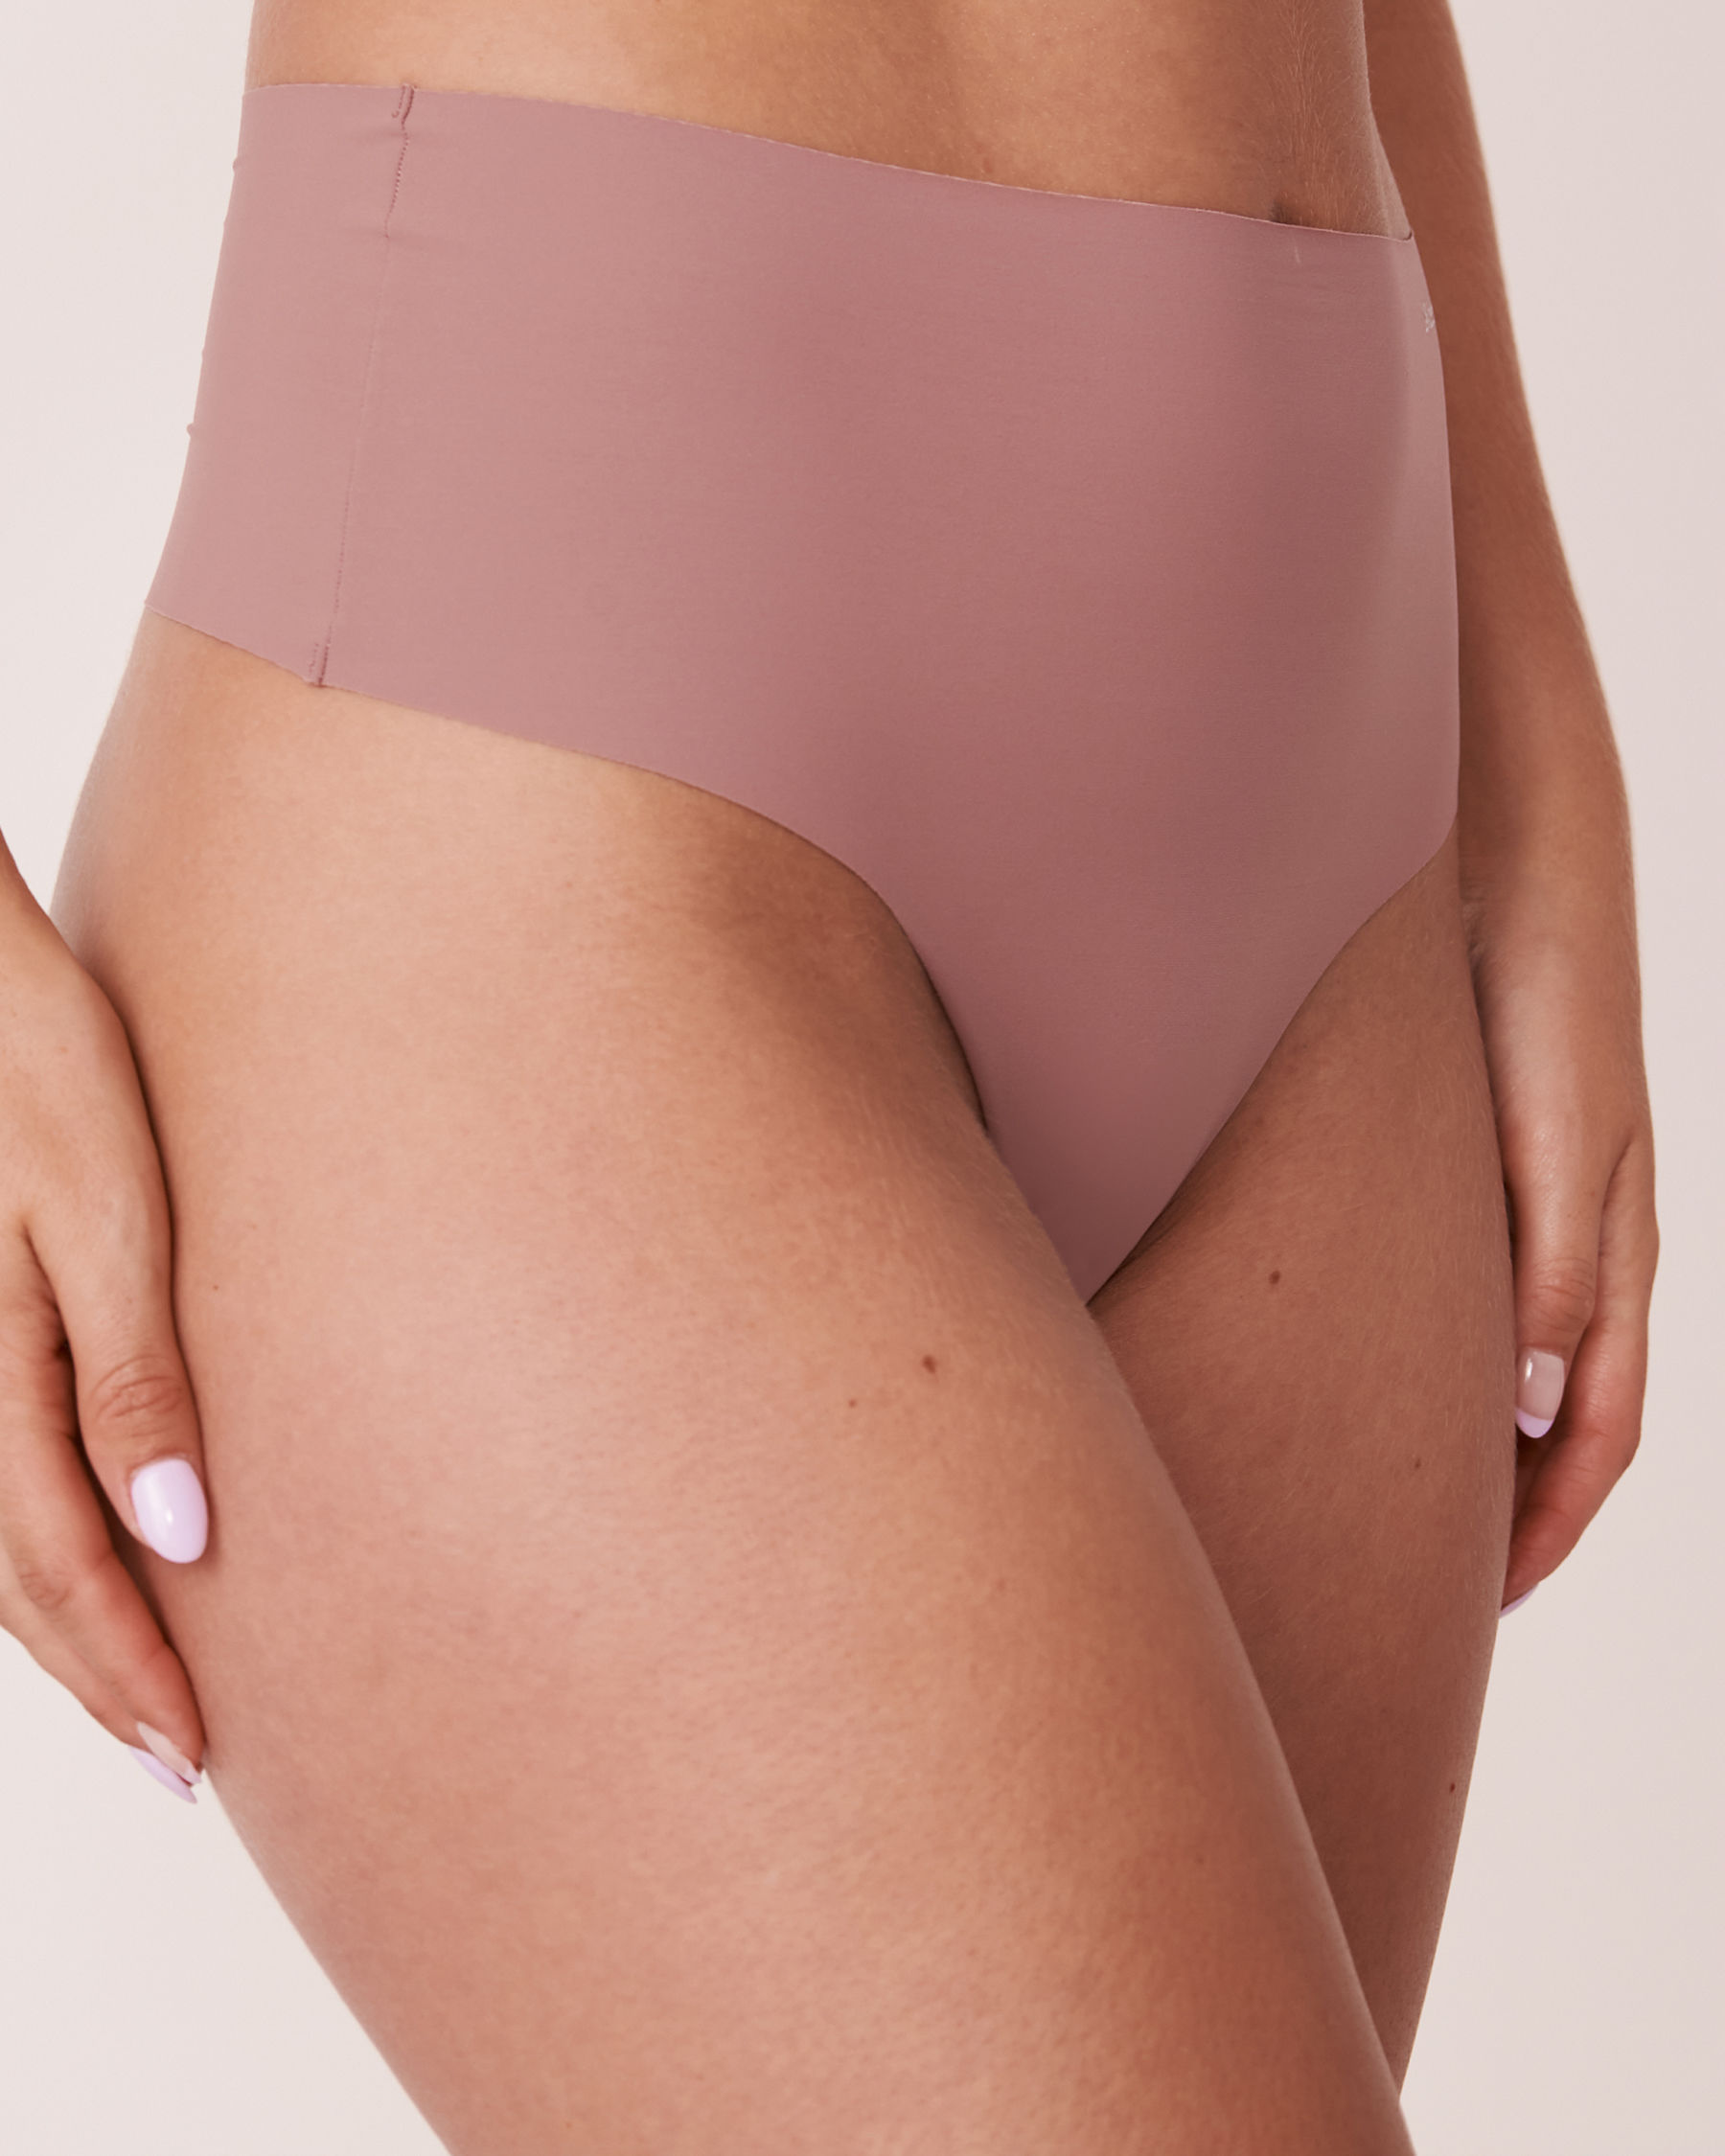 LA VIE EN ROSE Seamless High Waist Thong Panty Old pink 20200083 - View1